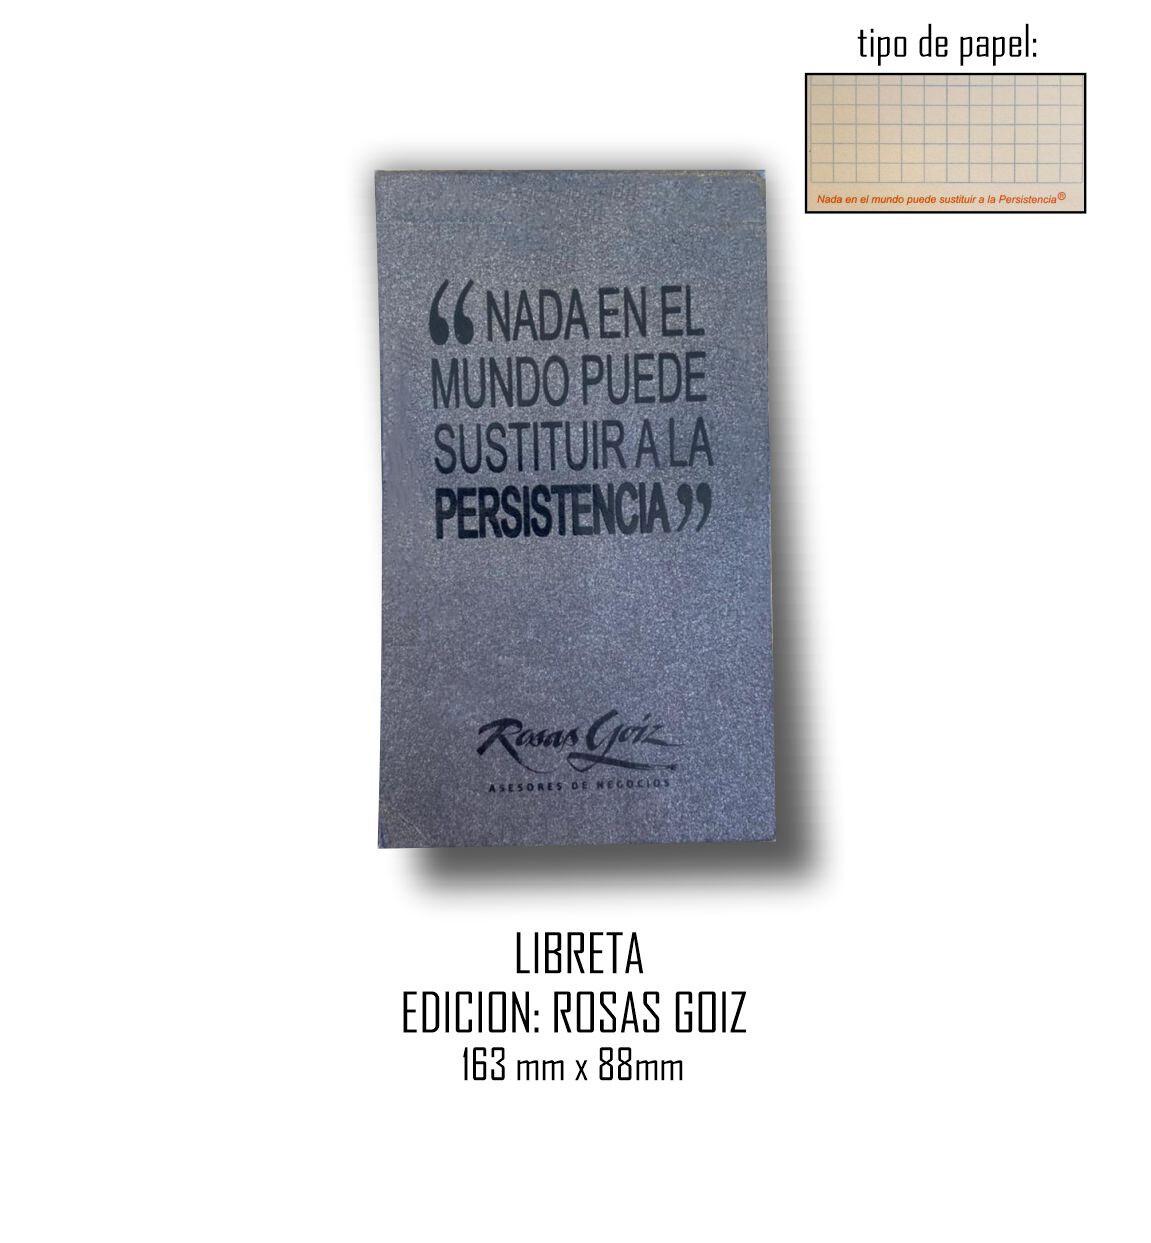 Libreta Edición: Rosas Goiz 163 mm x 88 mm